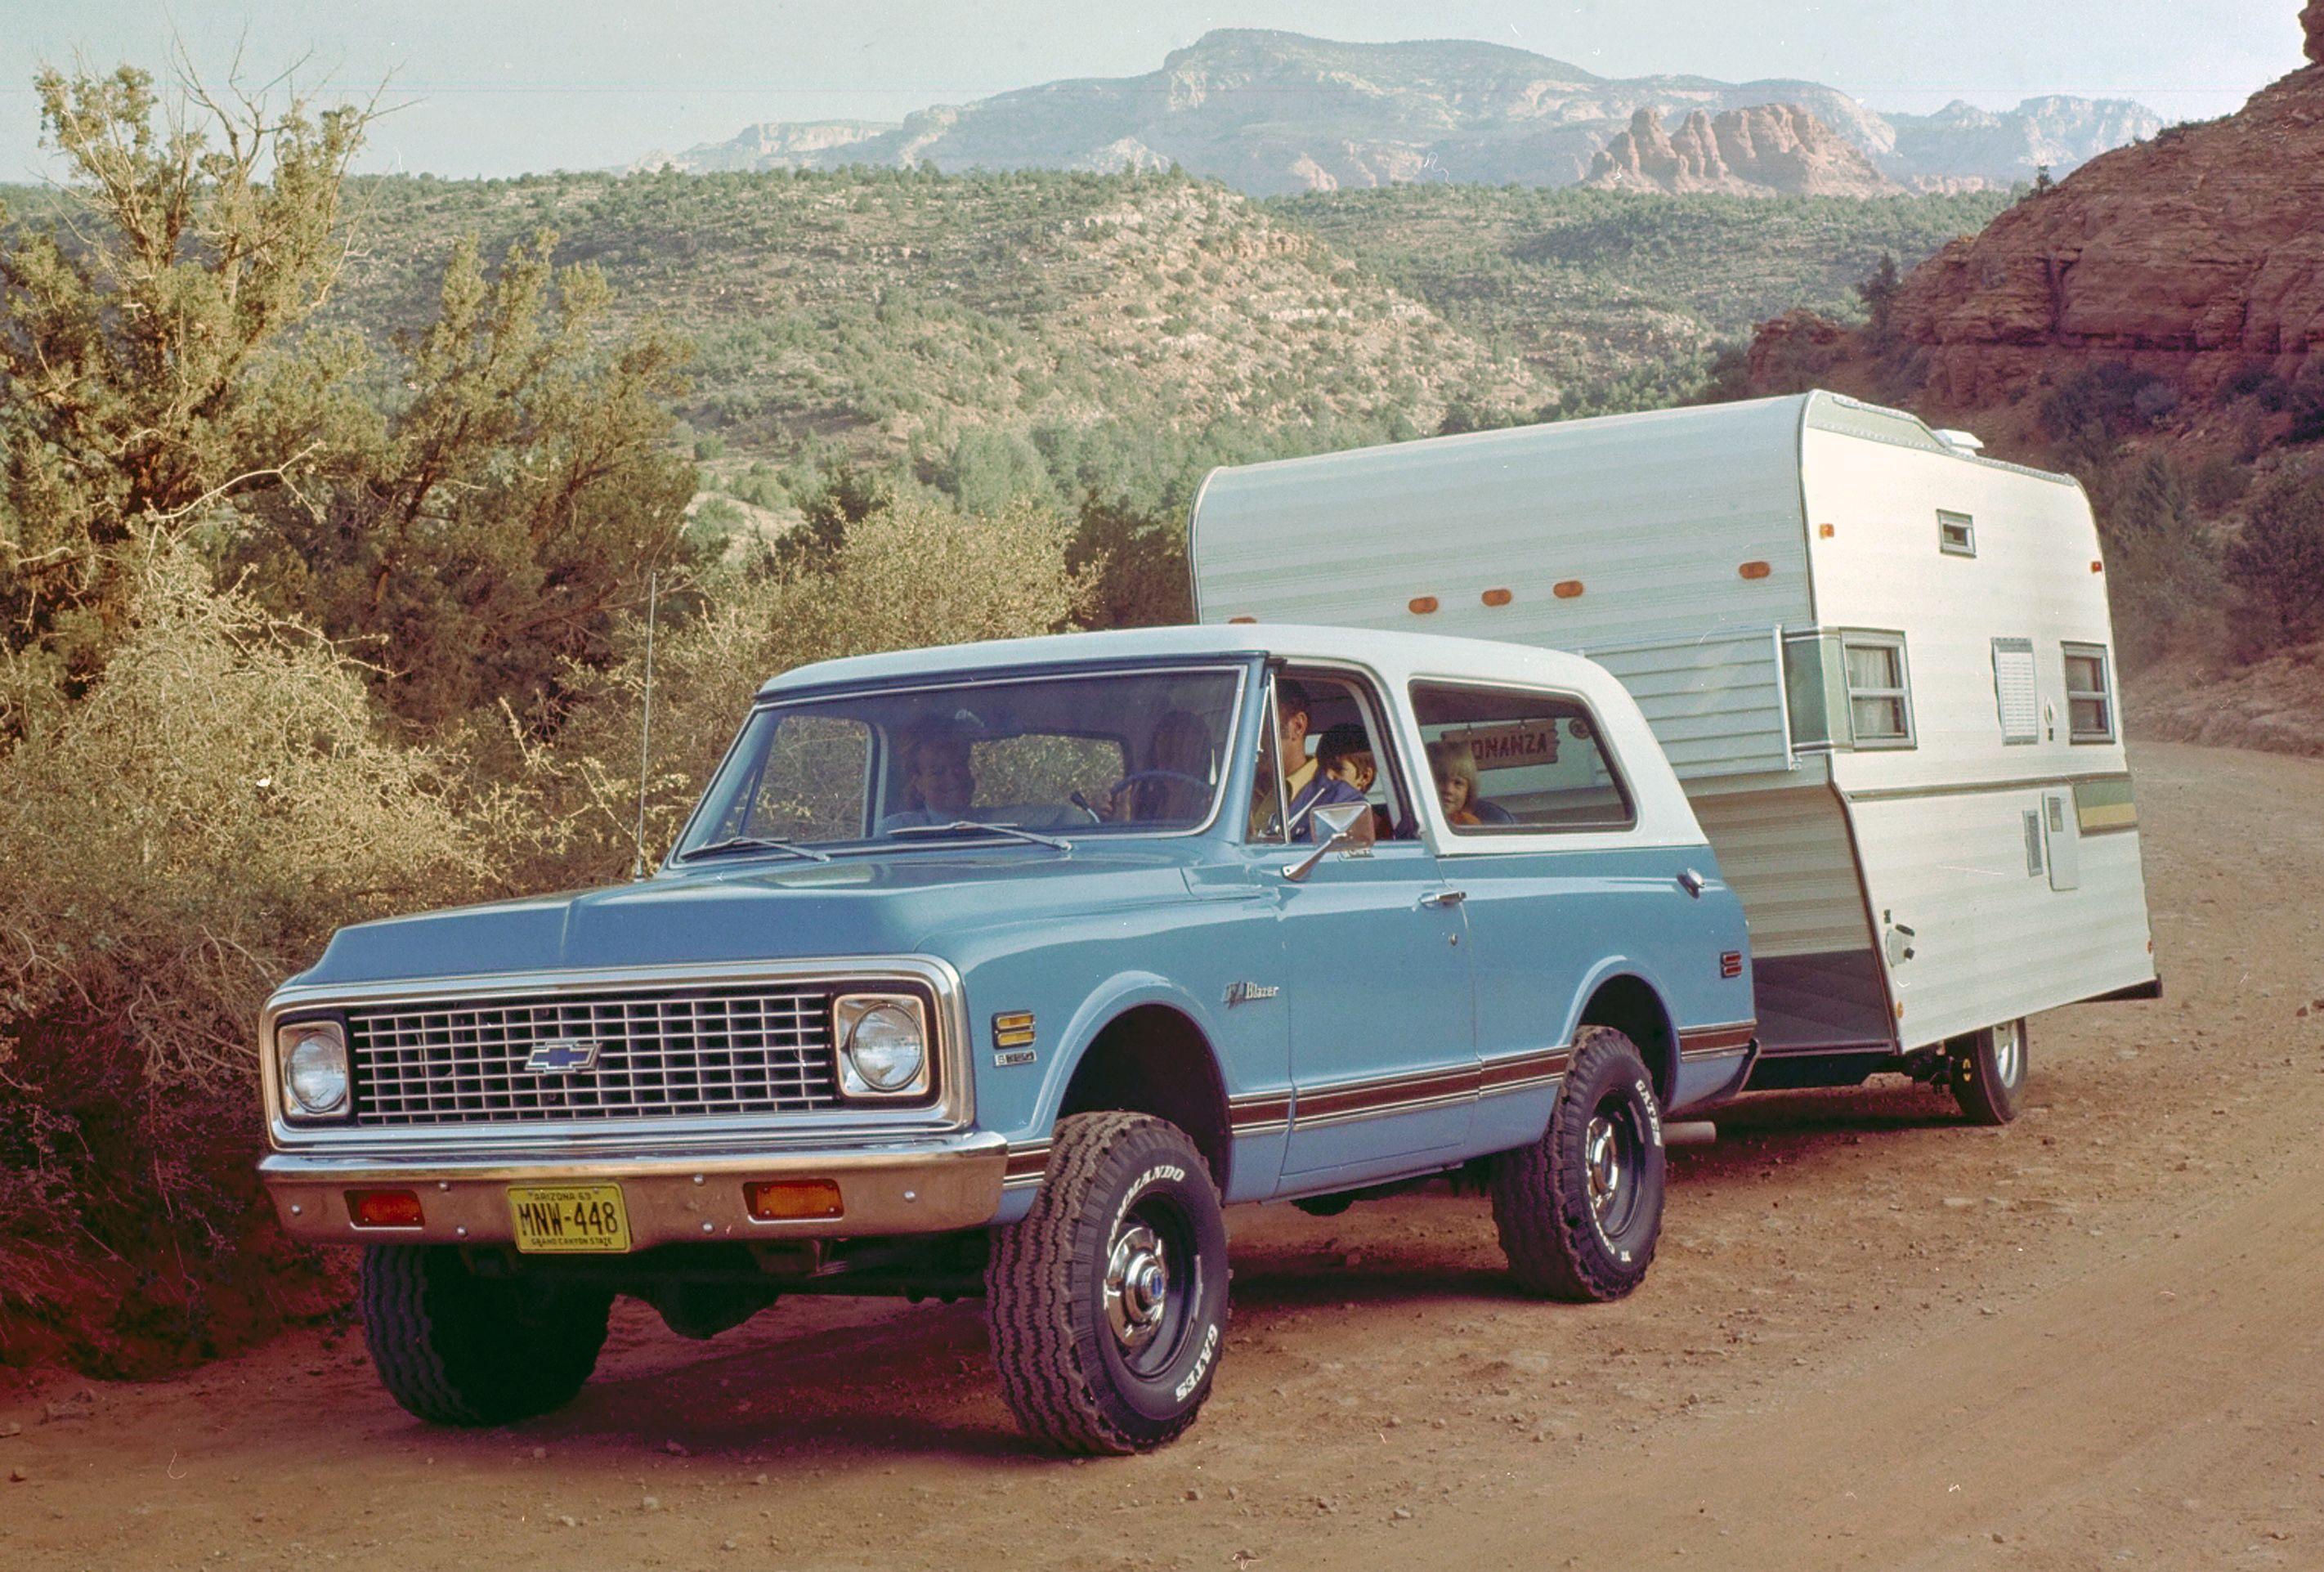 Half a centruy ago, the Chevrolet Blazer took the first step in suburbanizing the SUV | RK ...